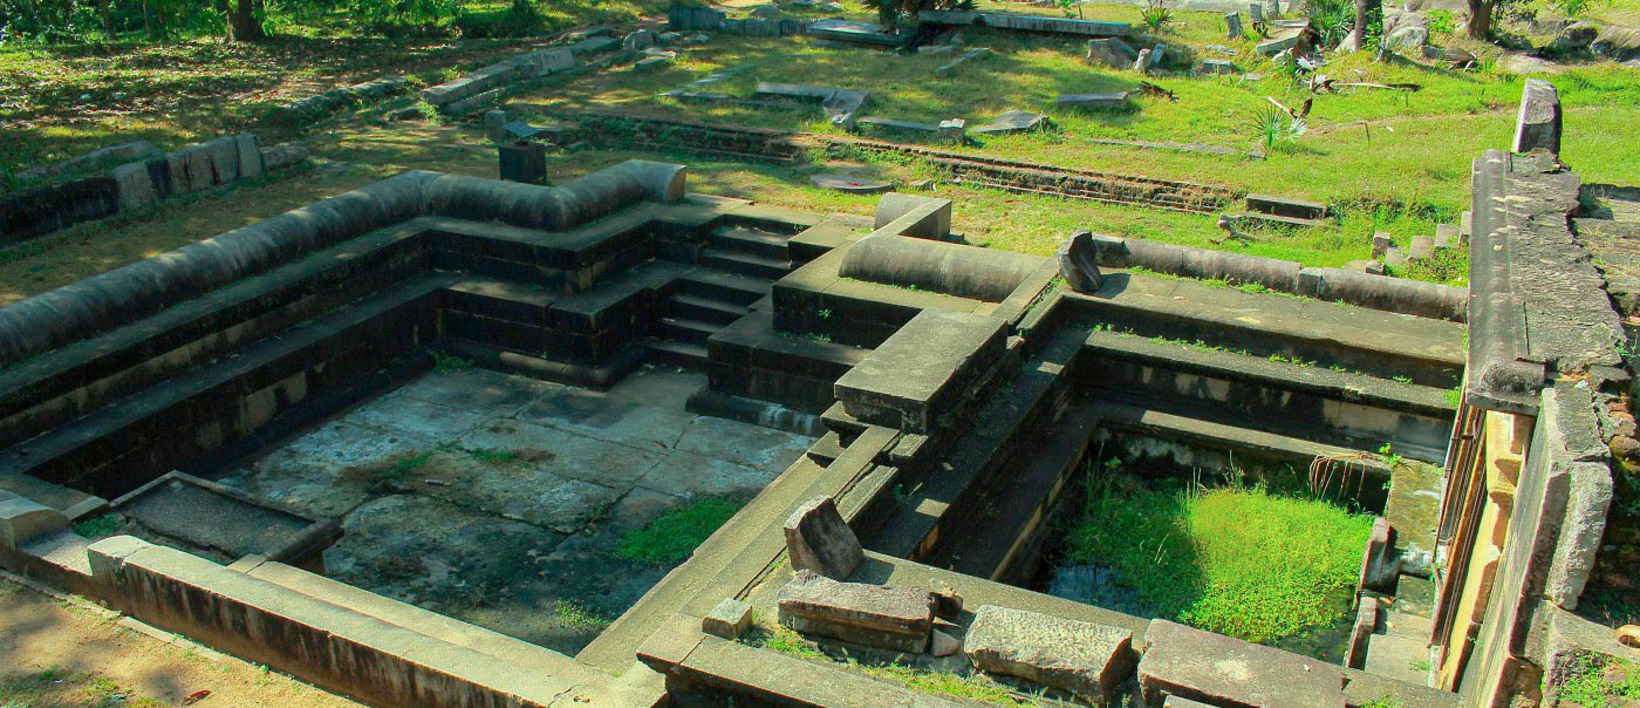 Ranmasu Uyana, Anuradhapura